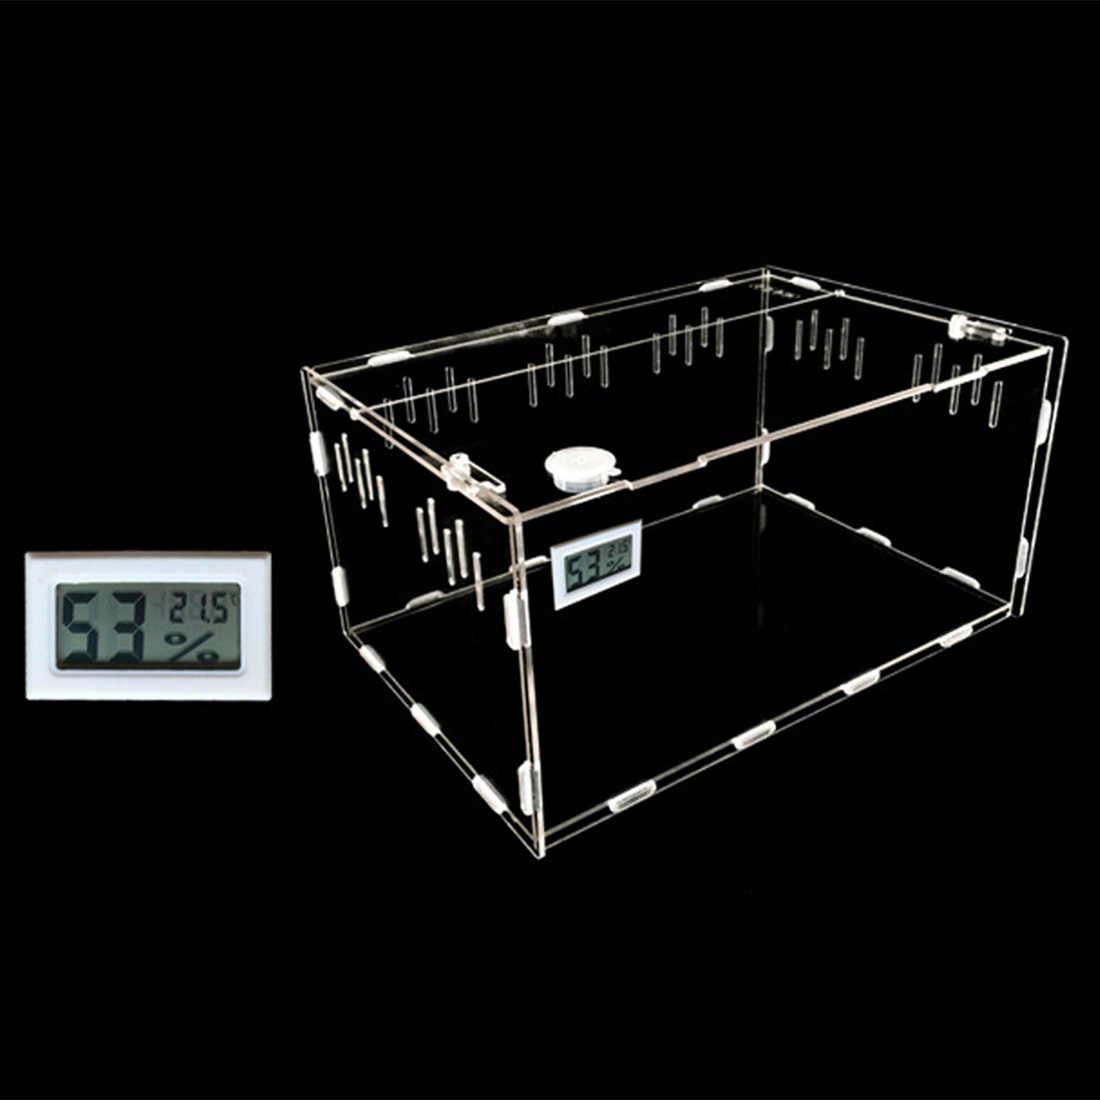 Acrylic Reptil Makan Kotak Crawler Hewan Peliharaan Makan Wadah dengan Suhu Hygrometer